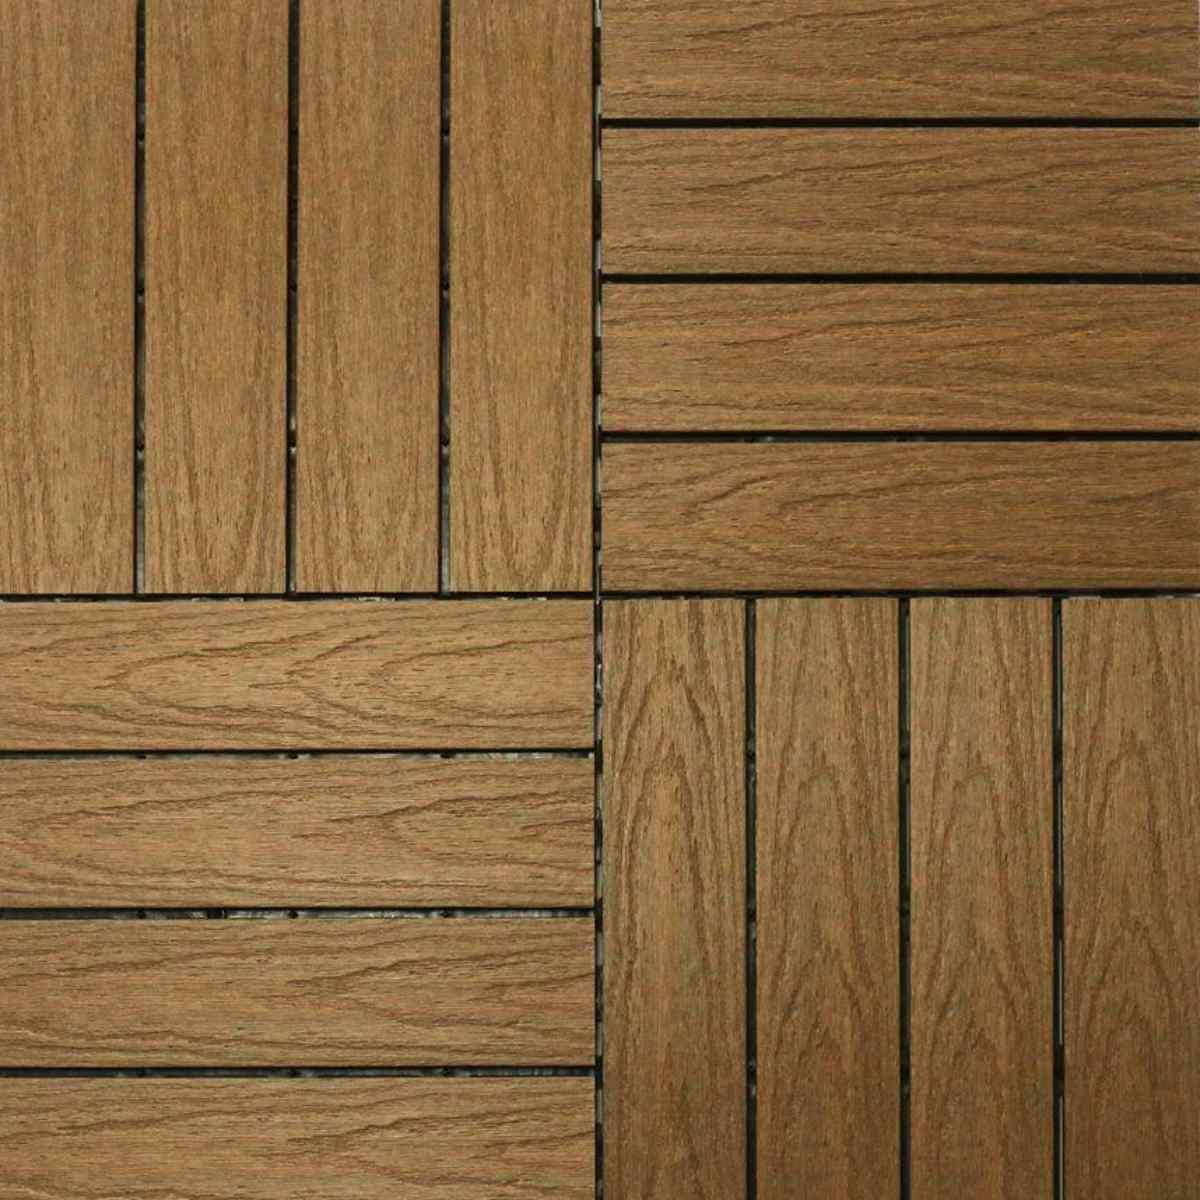 Deck Tile Peruvian Teak Best Laminate, Deck Laminate Flooring